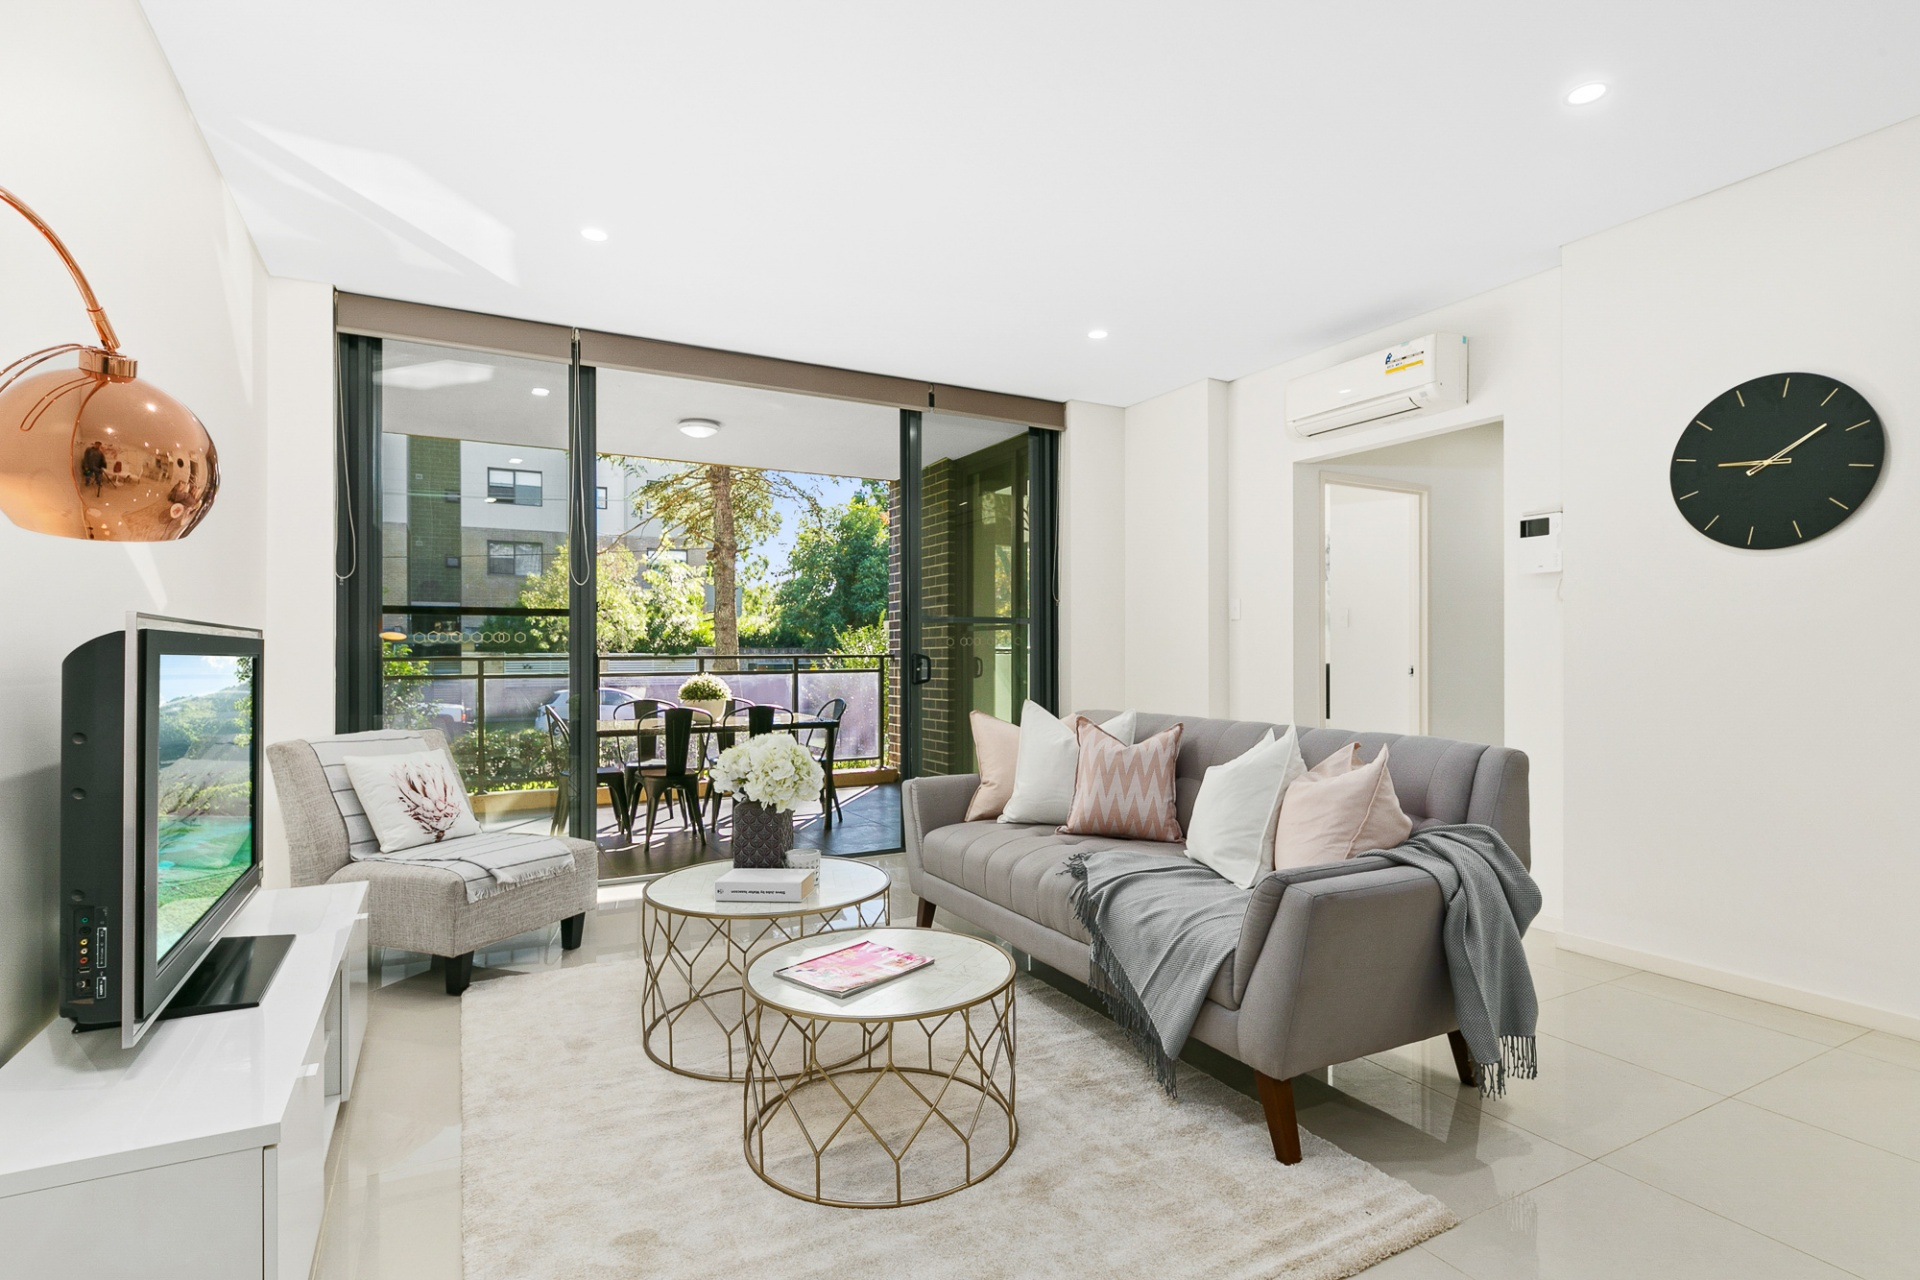 2 Bedrooms, Apartment, Sold , Buckingham Road, 2 Bathrooms, Listing ID 1385, Killara, NSW, Australia, 2071,